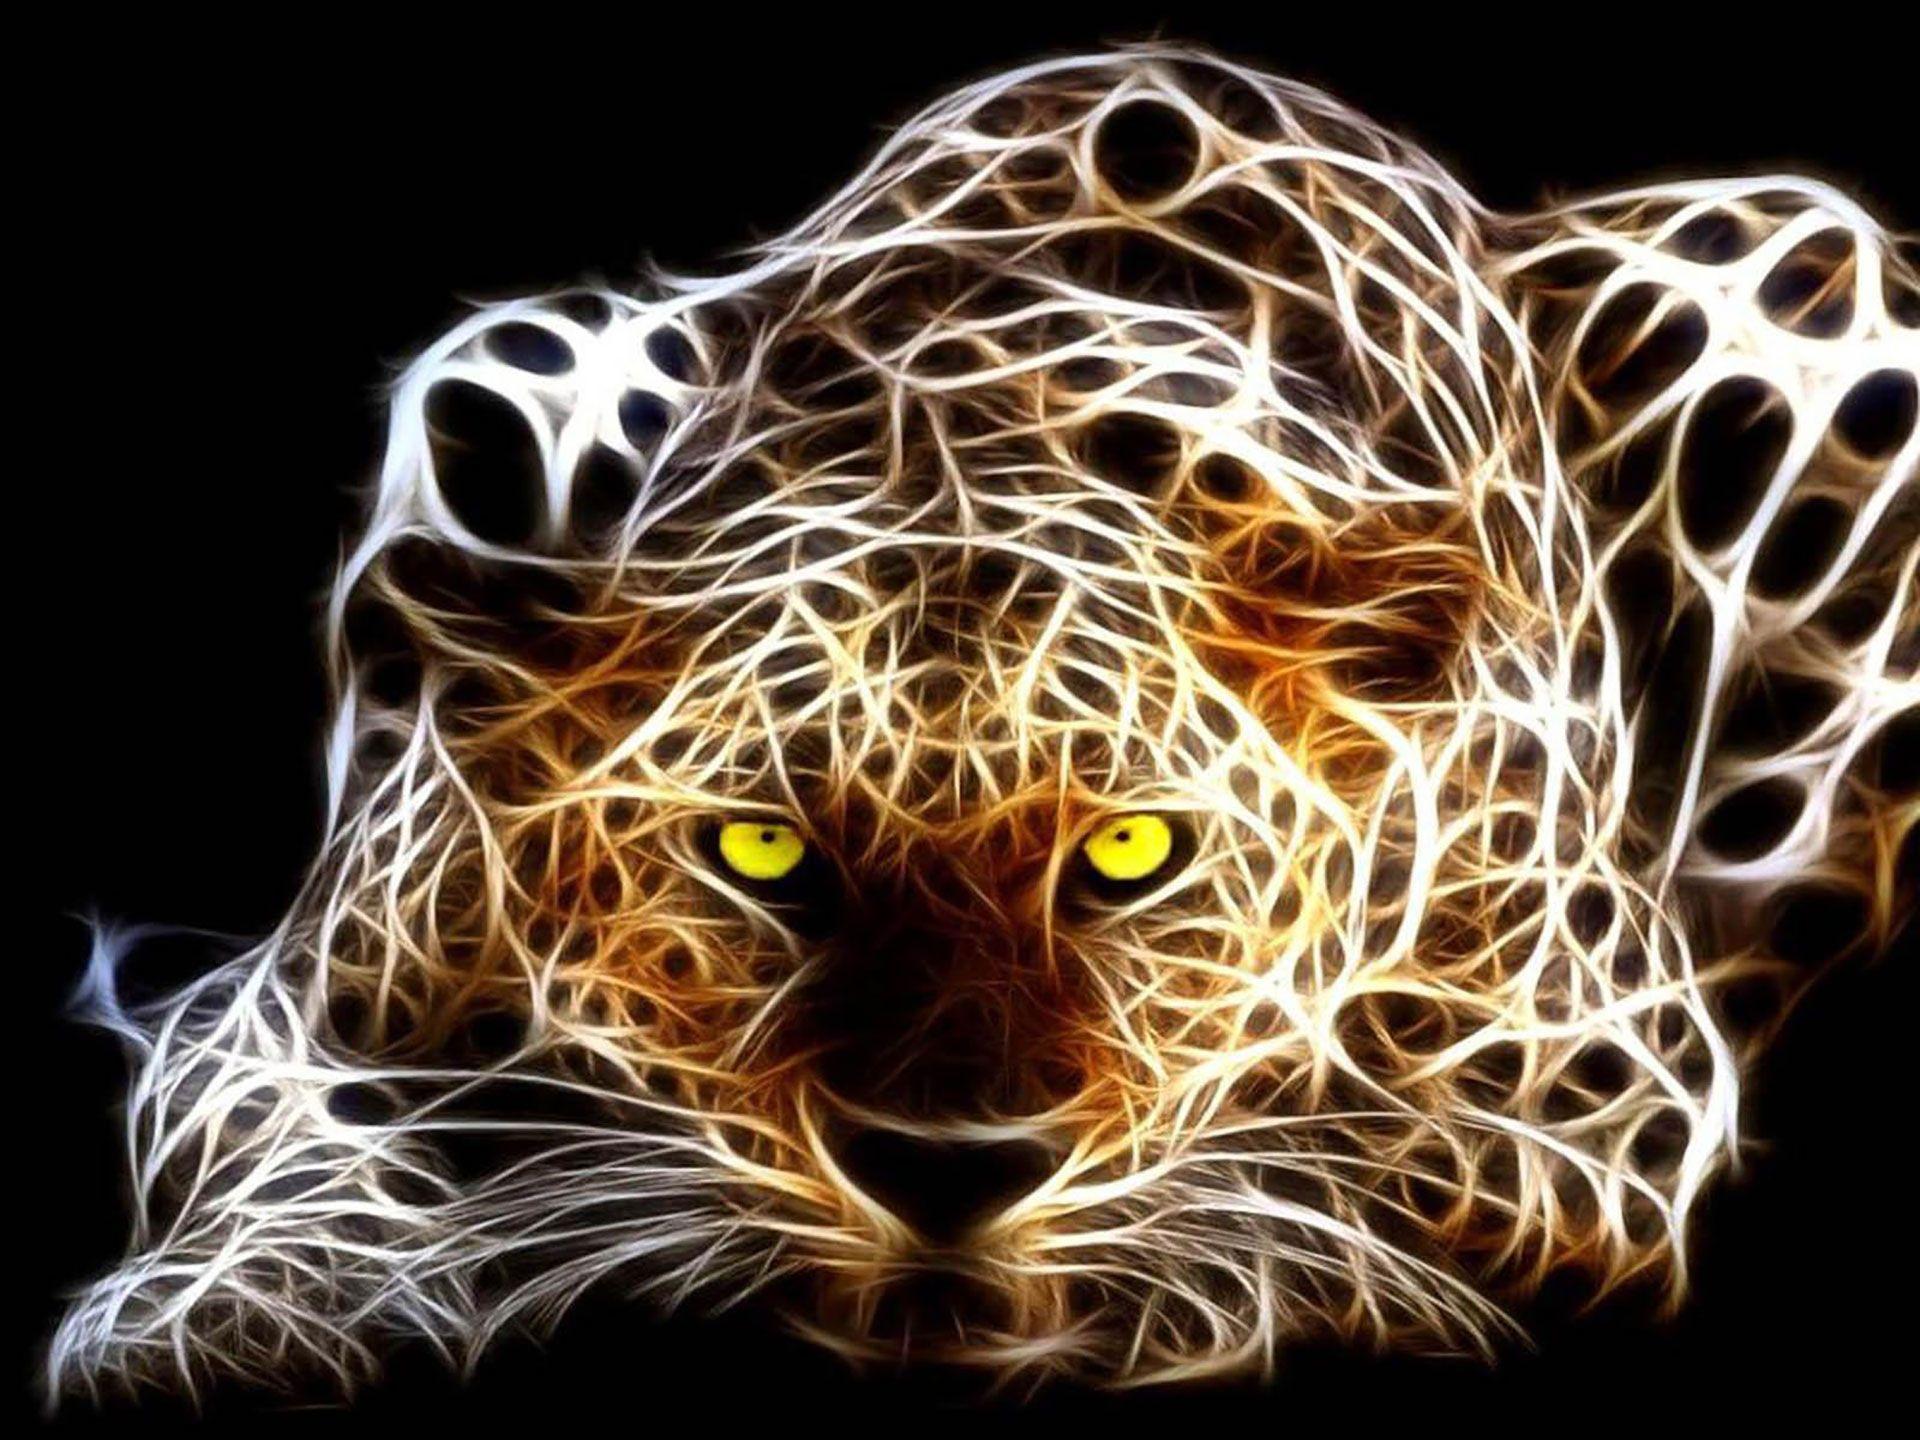 Animated Cheetah Wallpaper 3d animal iphone wallpapers - top free 3d animal iphone